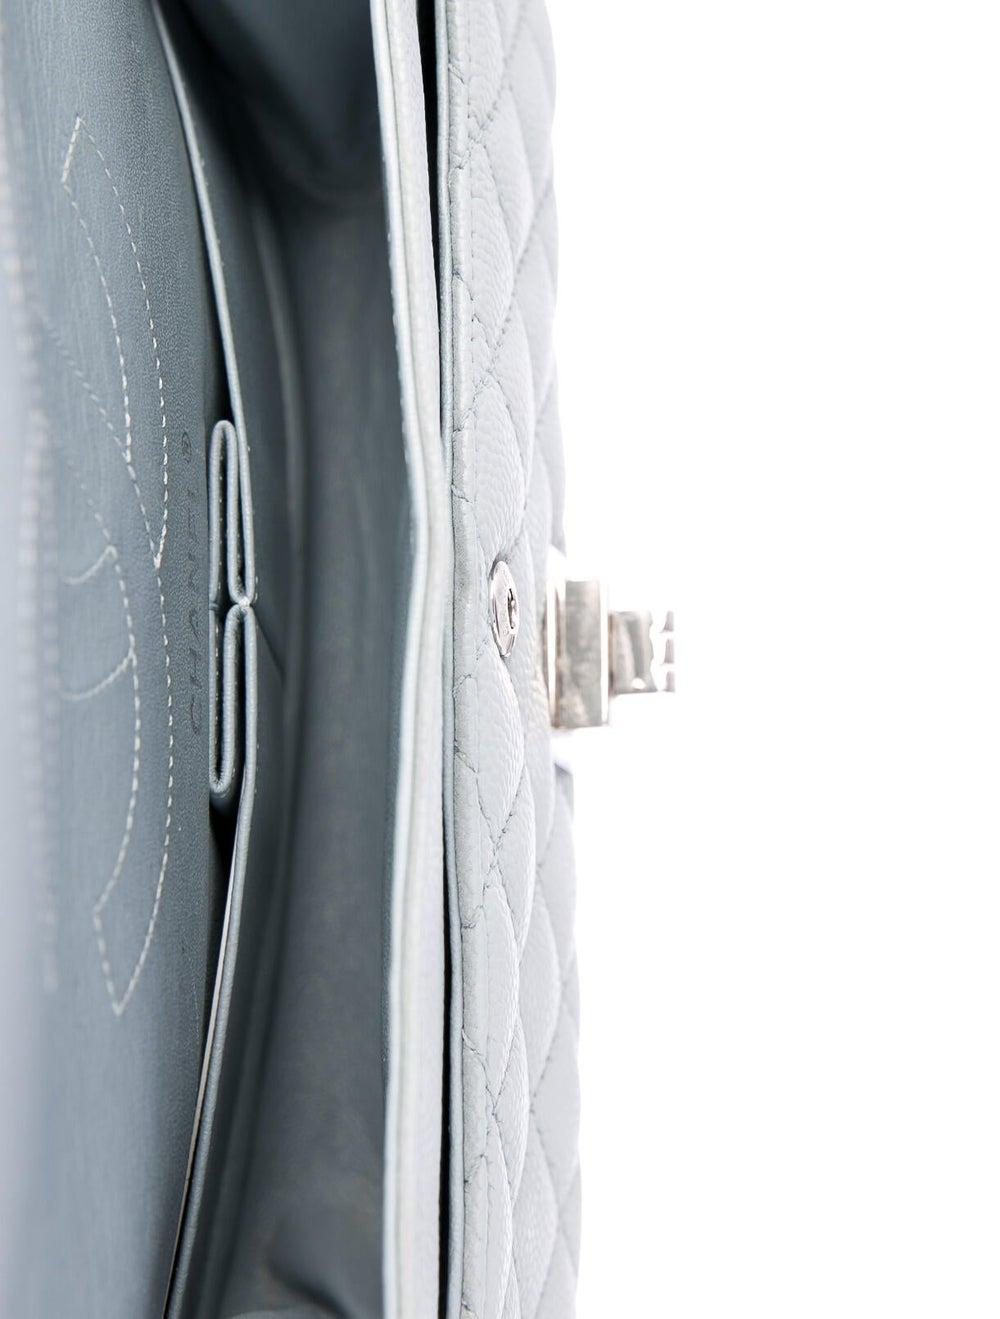 Chanel Reissue 225 Double Flap Bag Blue - image 5